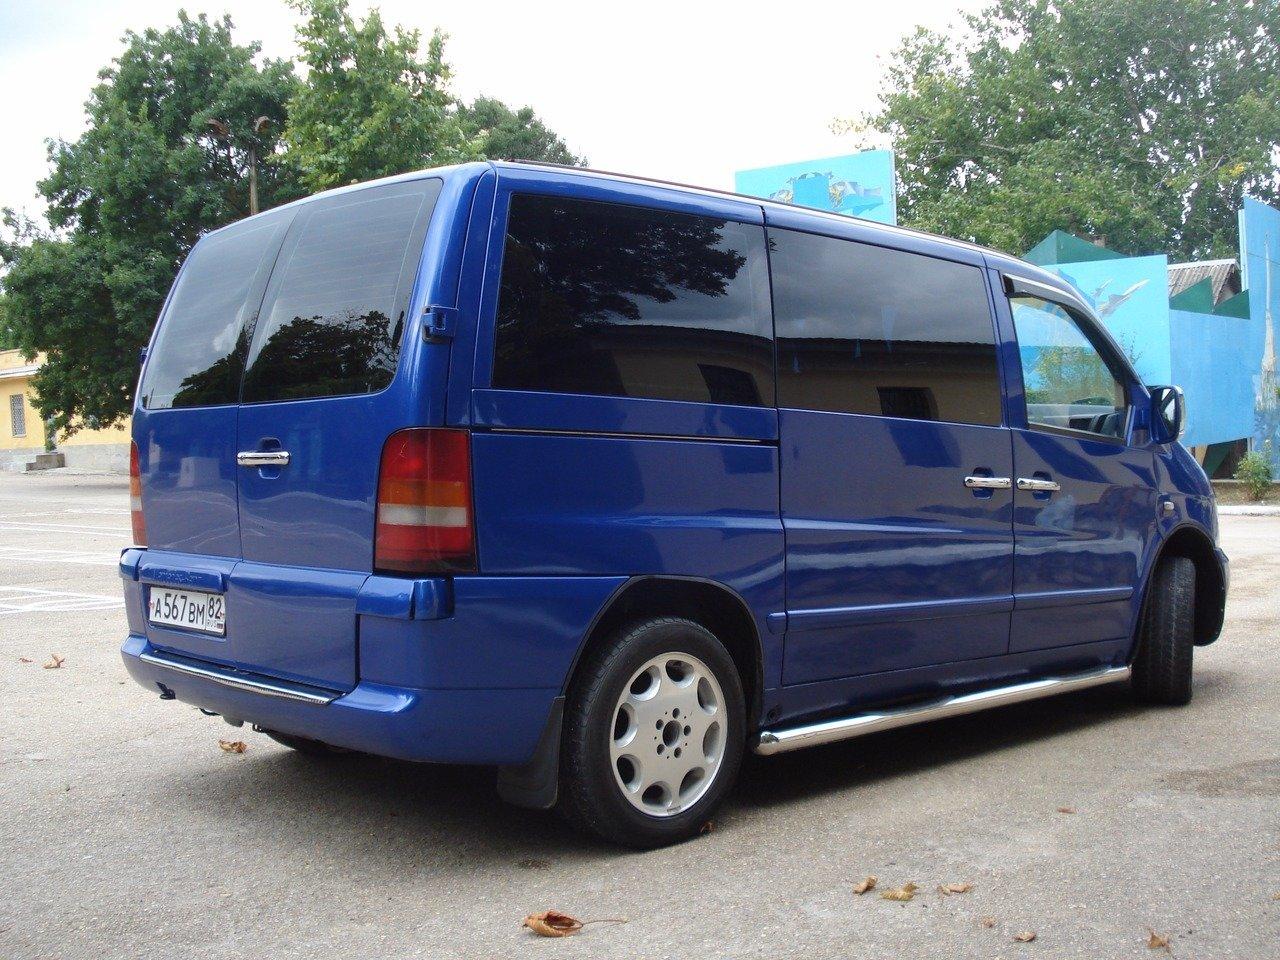 Mercedes-Benz Vito 2002, 2.2л., мкпп, дизель